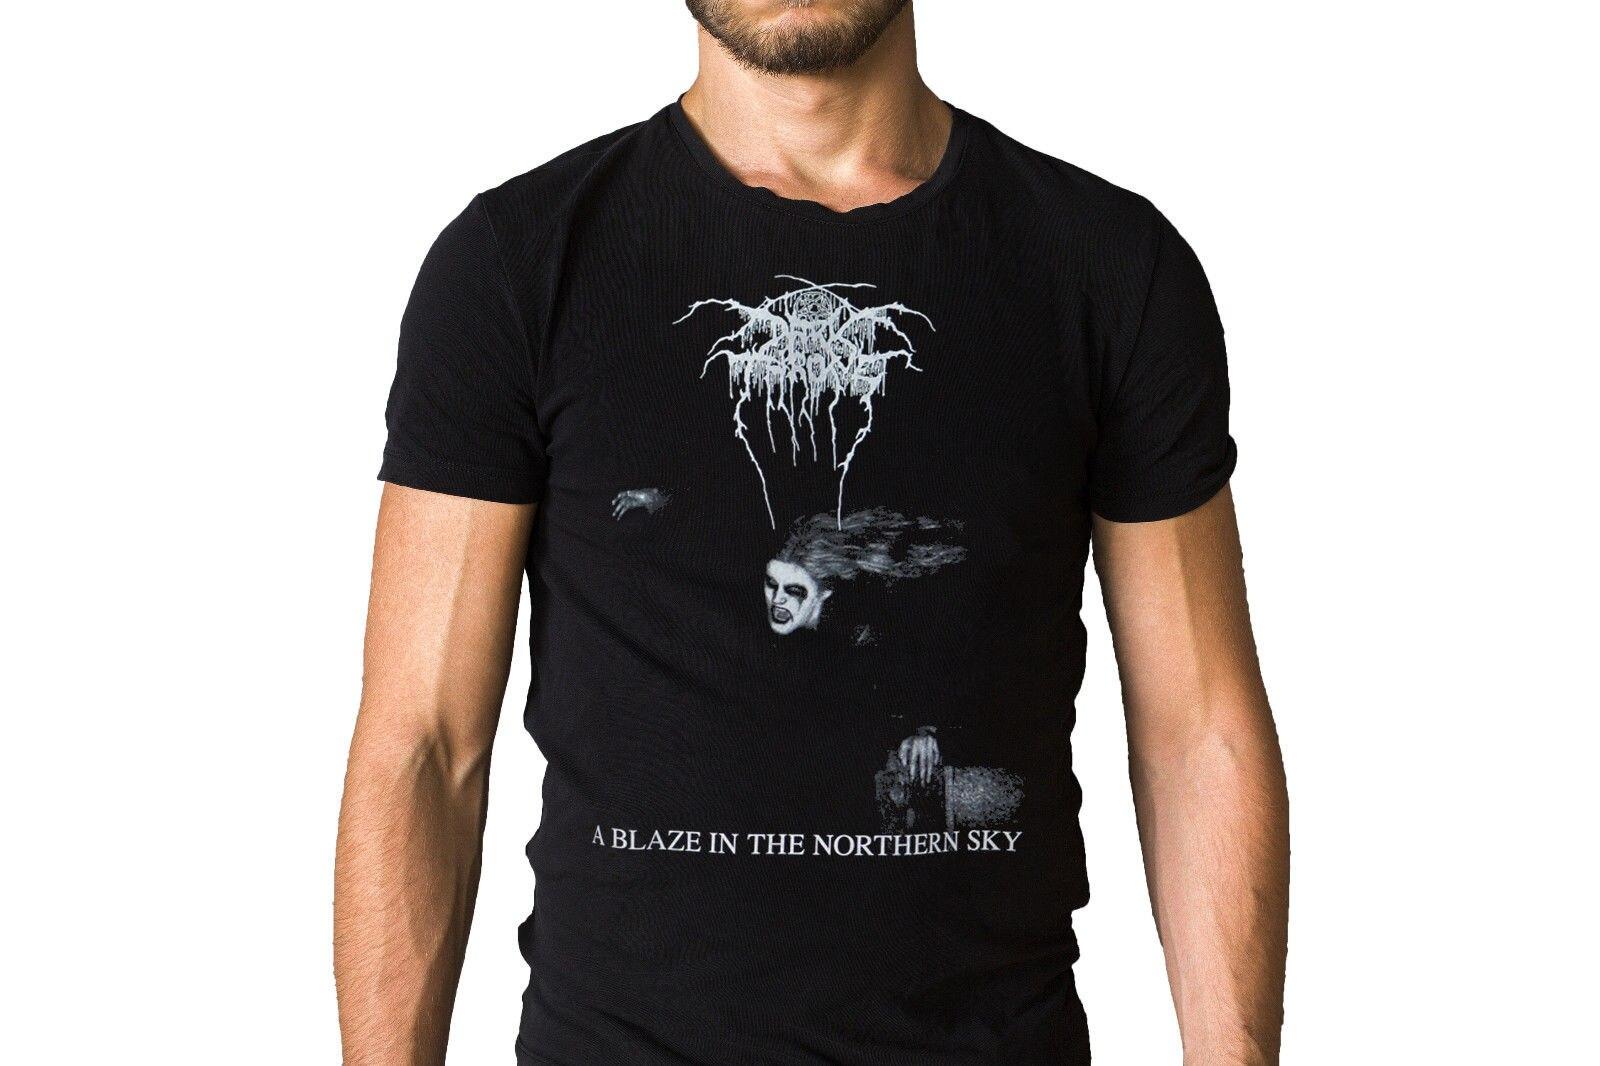 Darkthrone пожар в Северного неба 1992 групповое фото вдохновил футболка ...